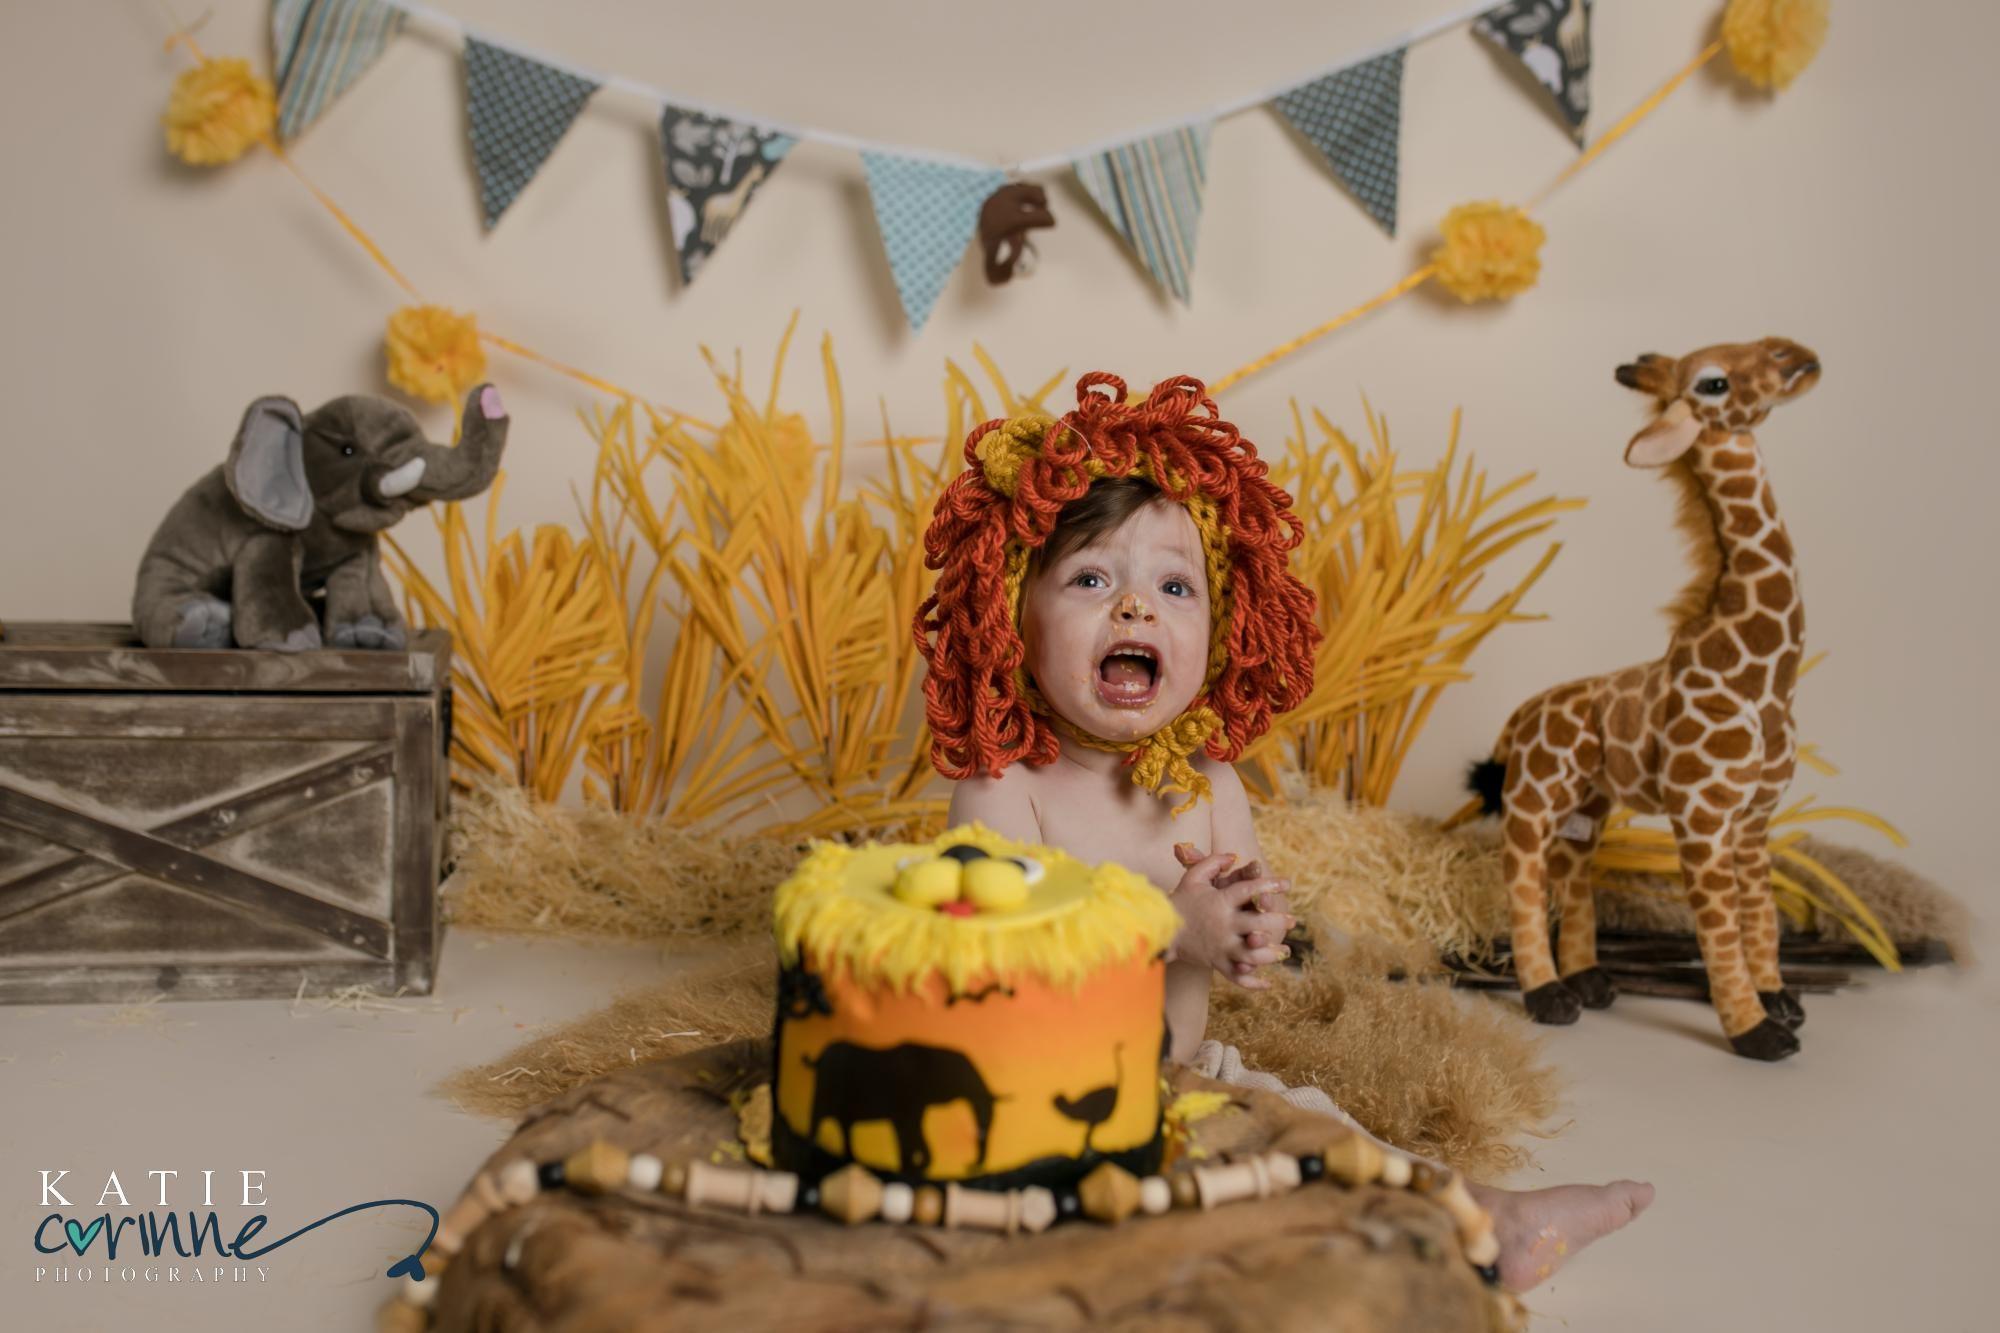 Safari Cake Smash Cake Smash Theme Lion King Birthday Cake Smash